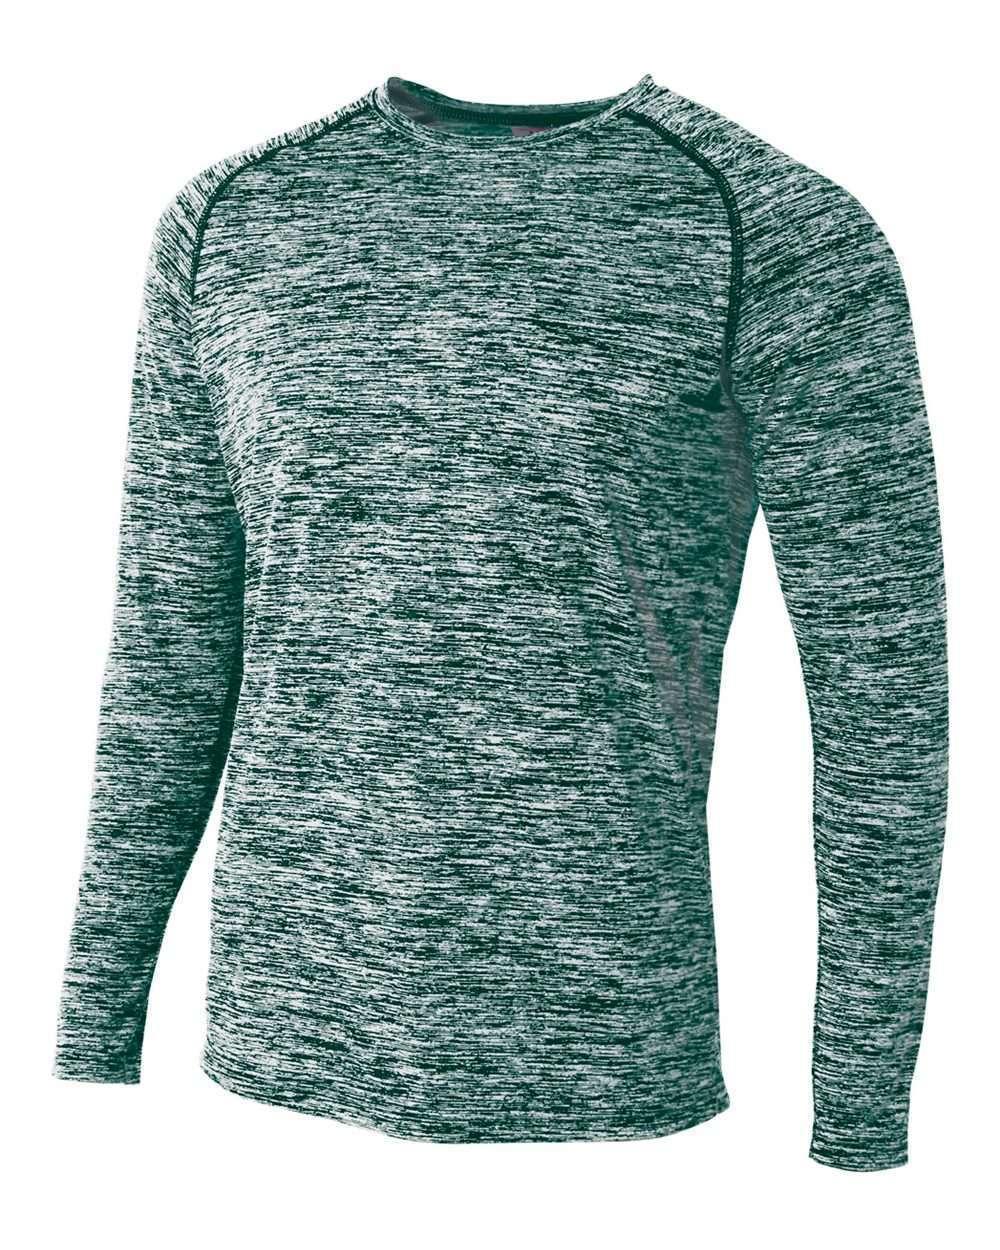 Adult Space Dye Long Sleeve Raglan T-Shirt